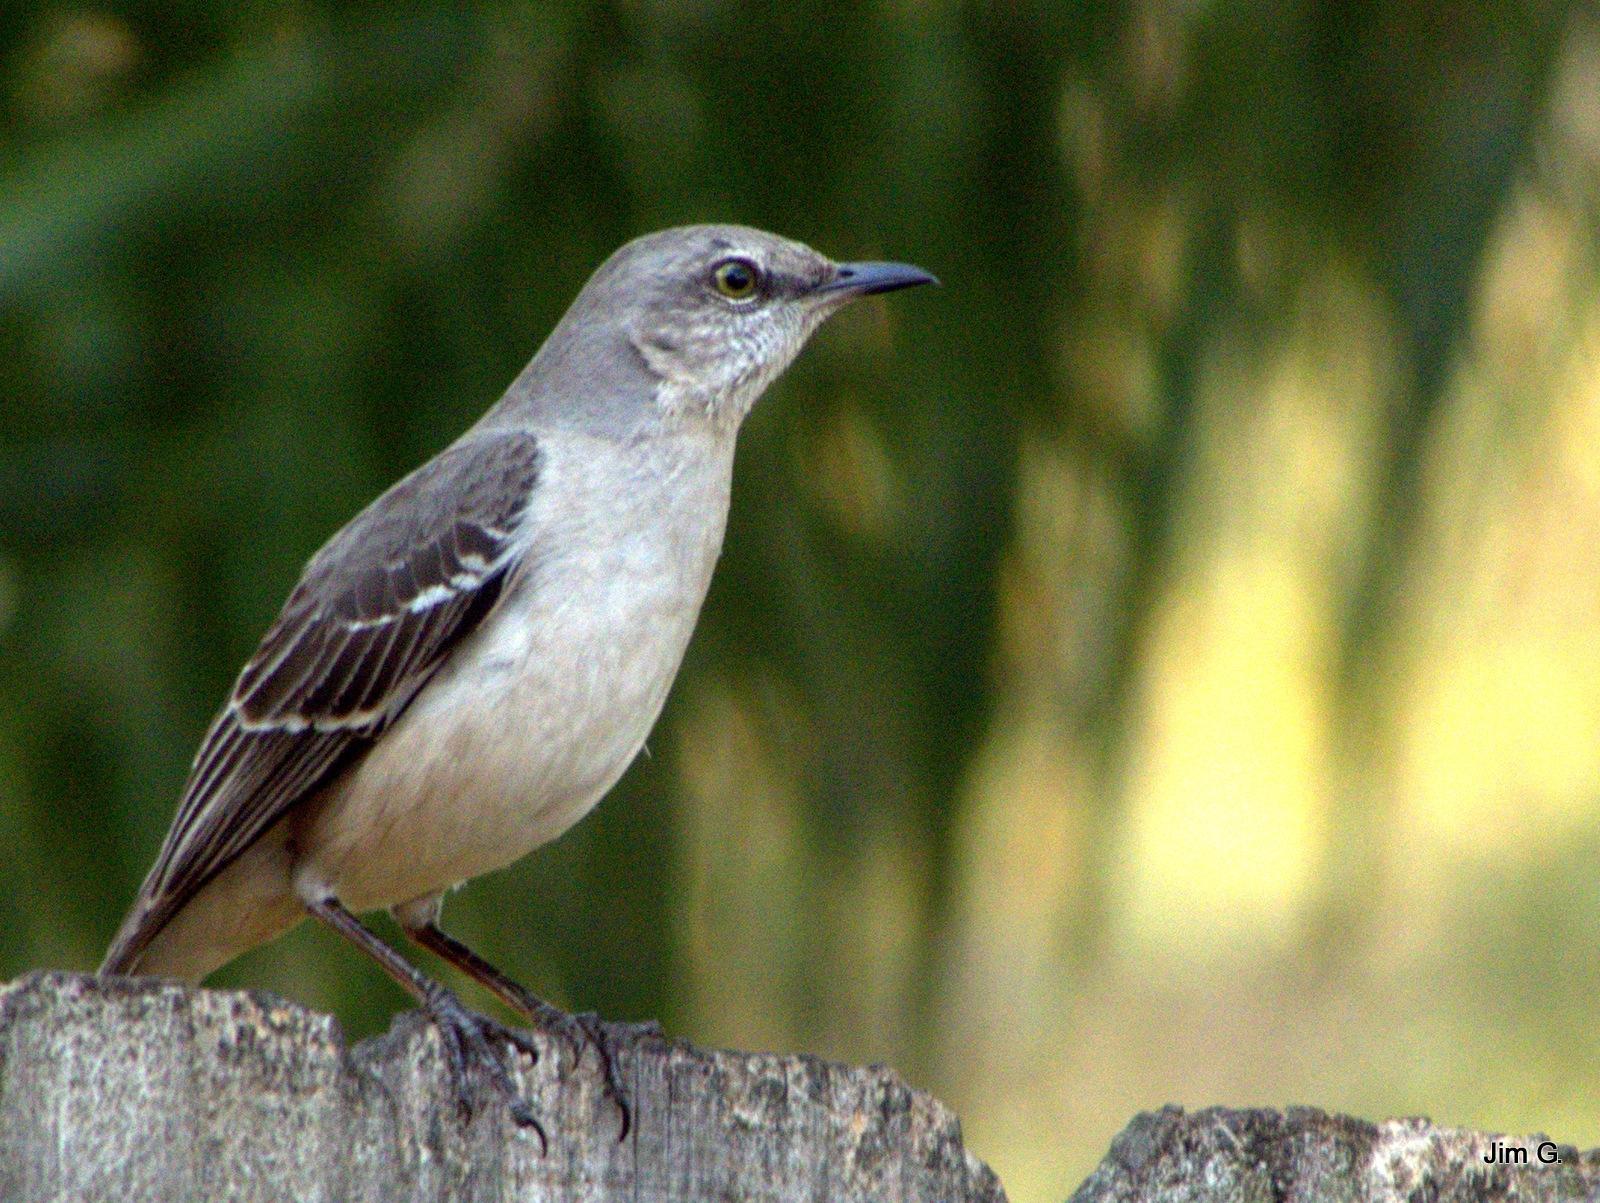 Mockingbird by Jim Graham